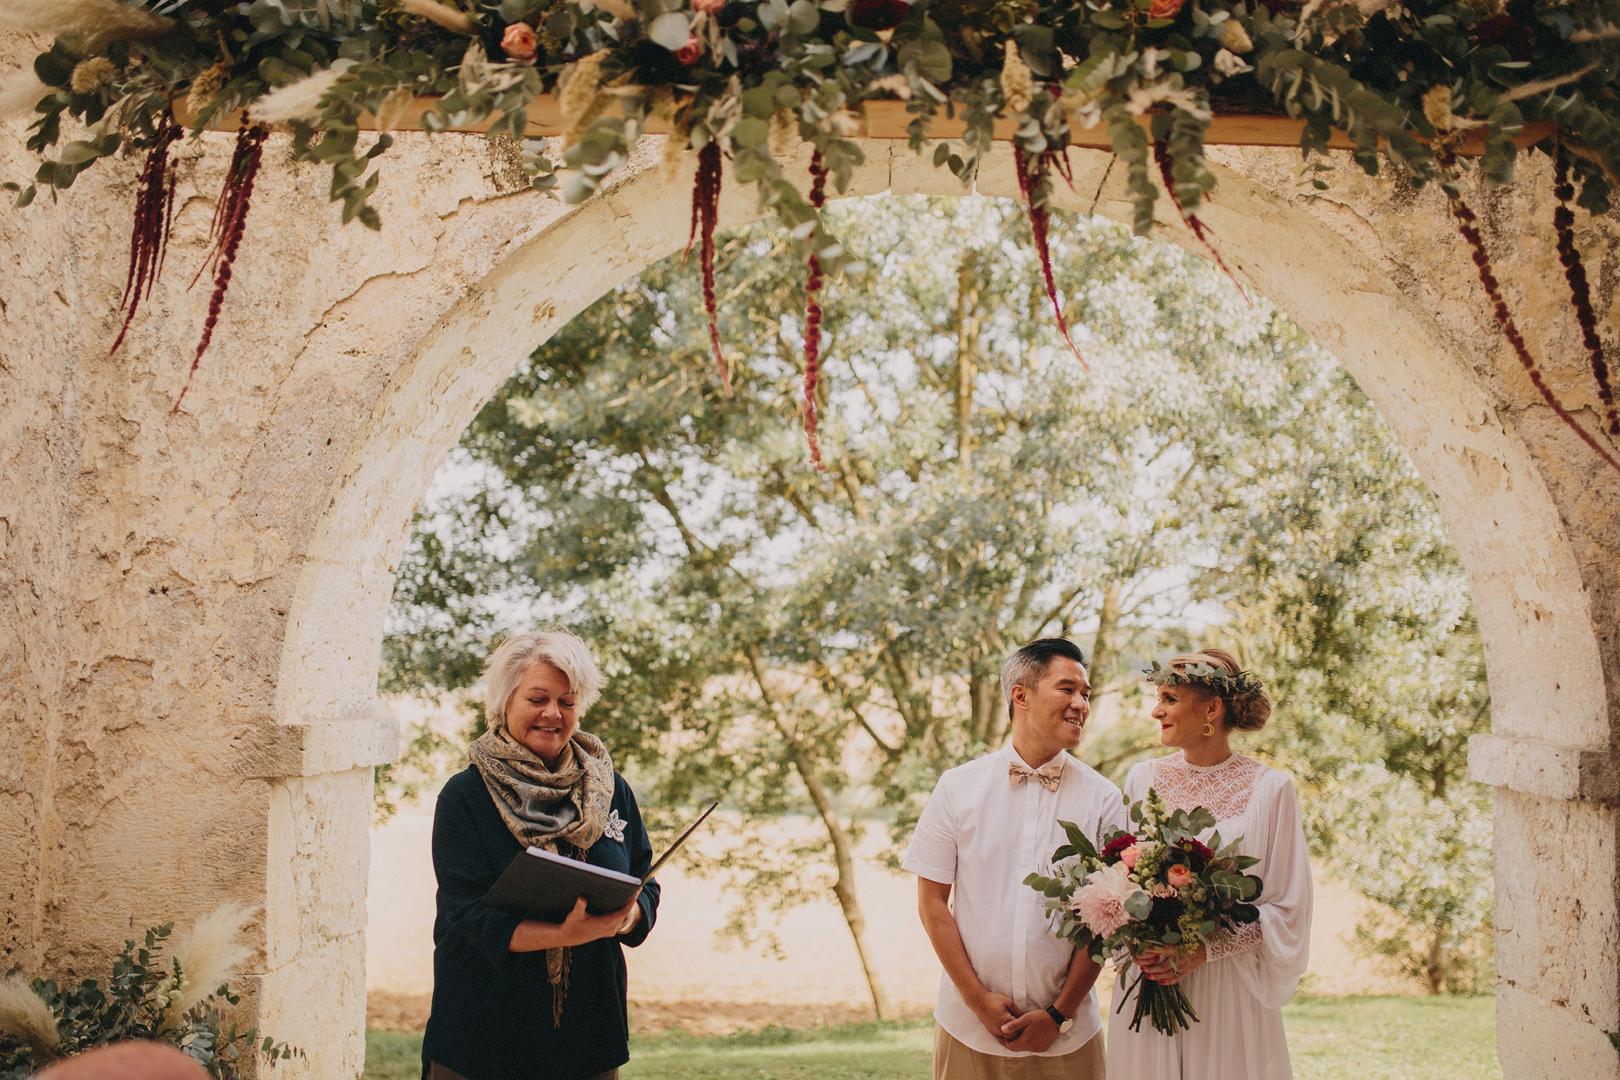 Wedding in Chateau de Puissentut